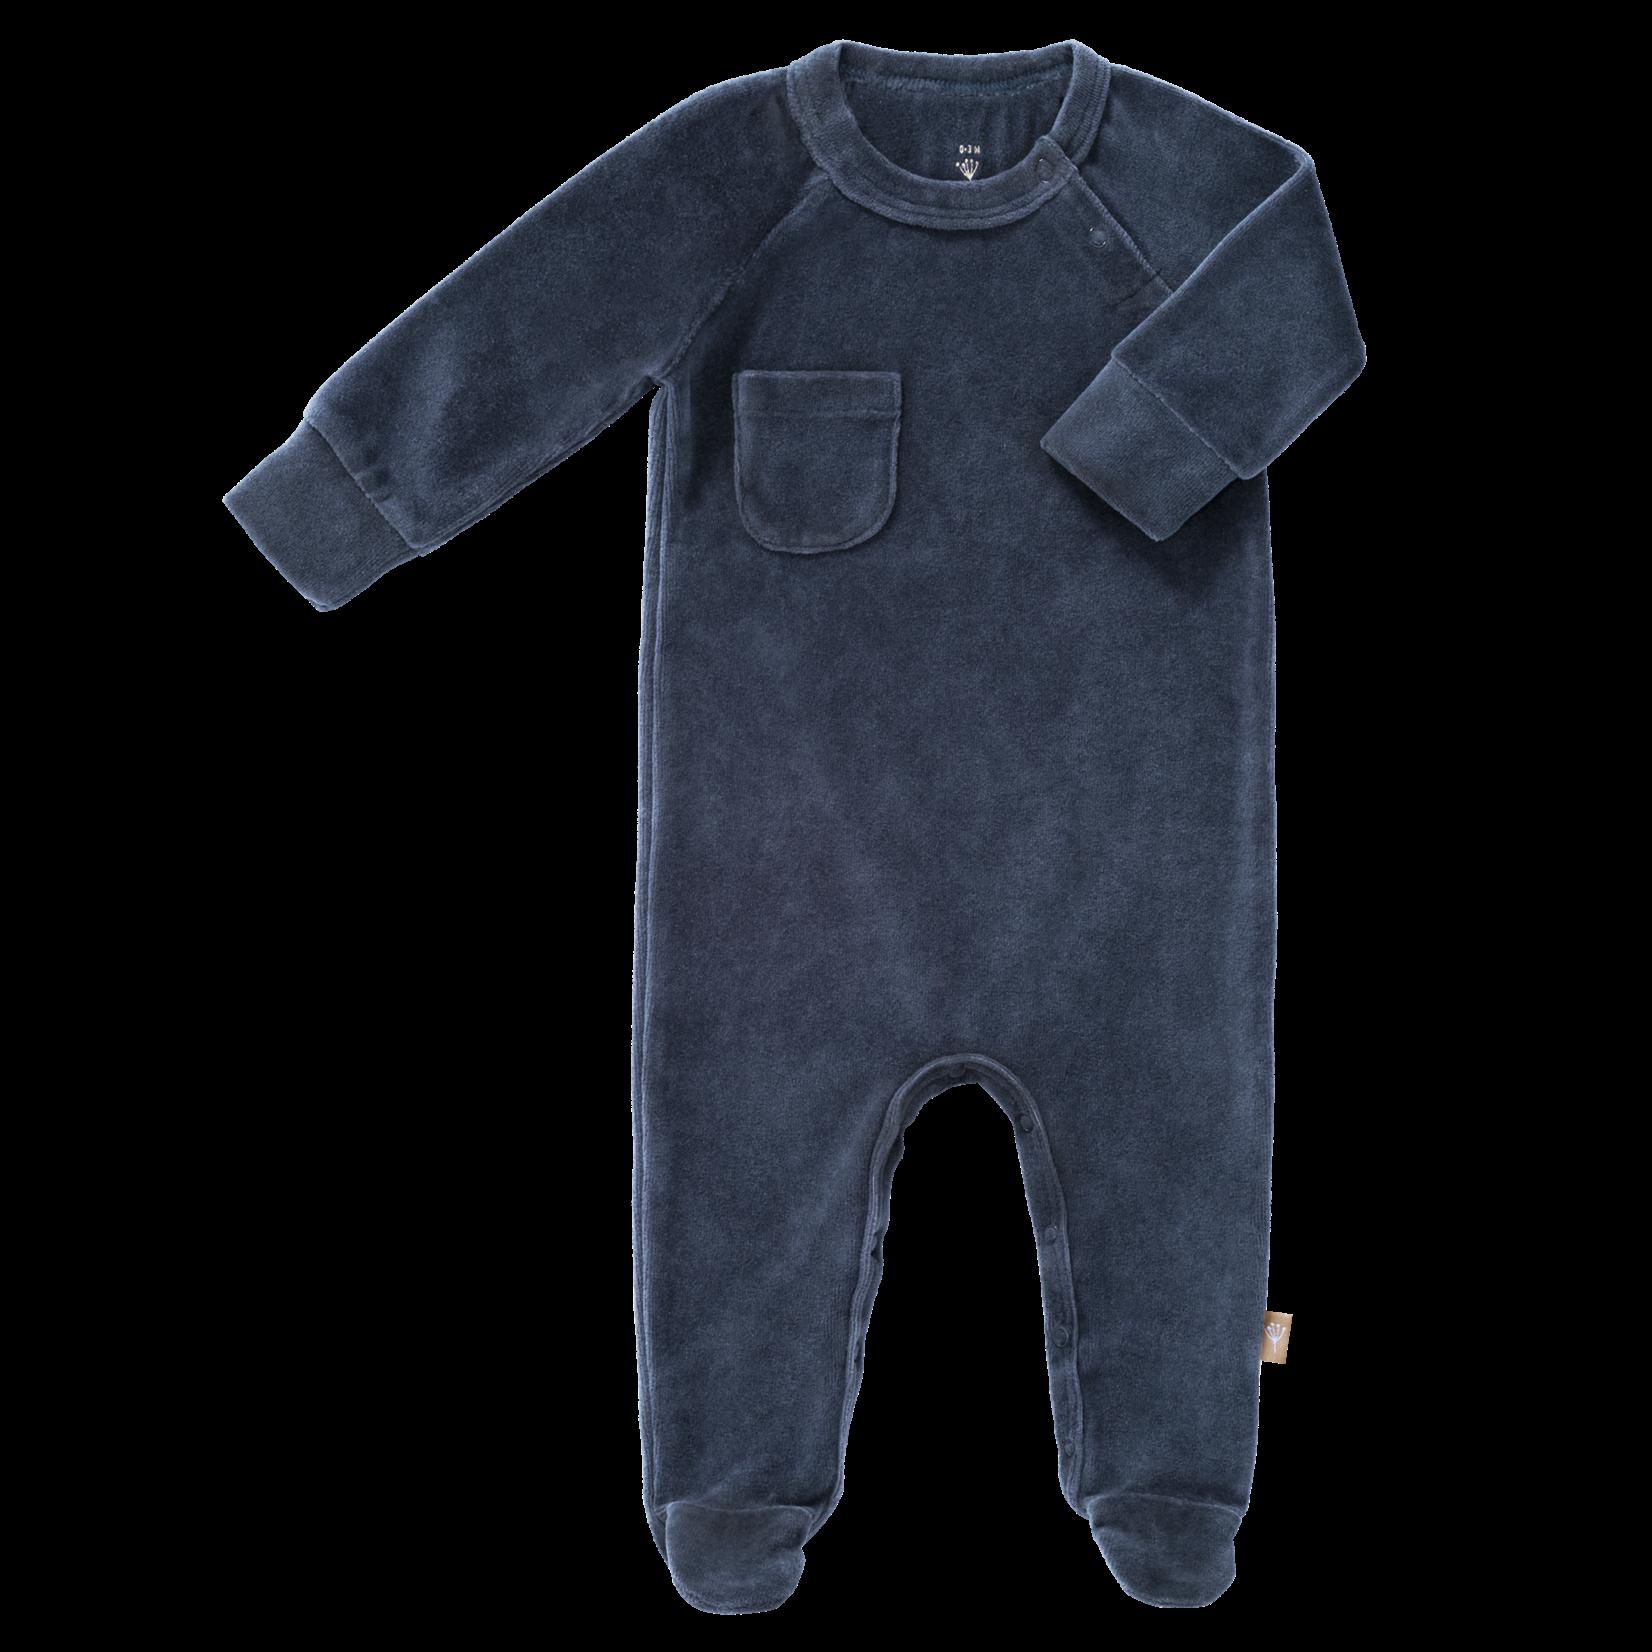 Fresk Pyjama velours met voet (Indigo)